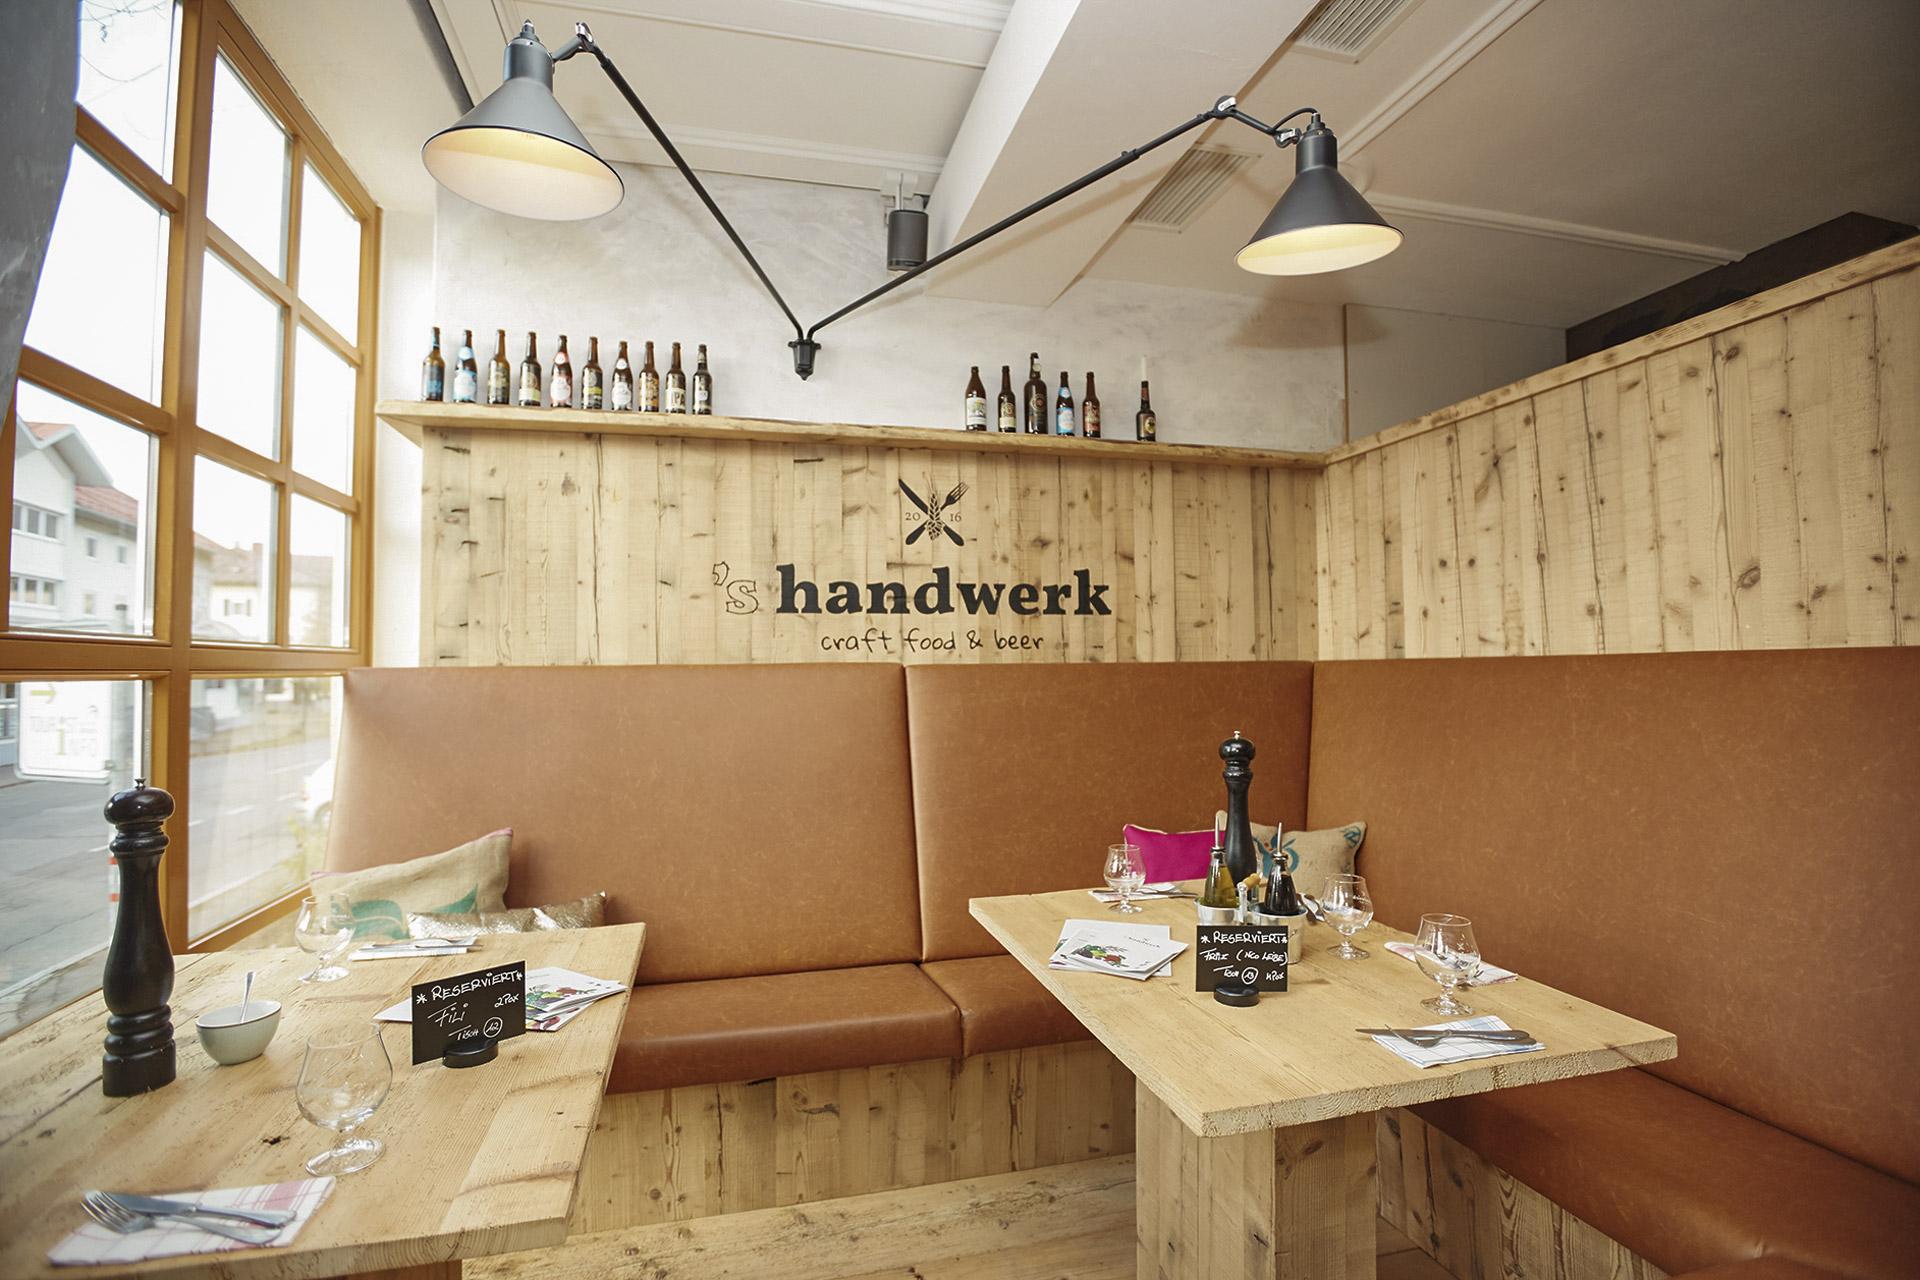 s handwerk - craft food & beer // Sonthofen